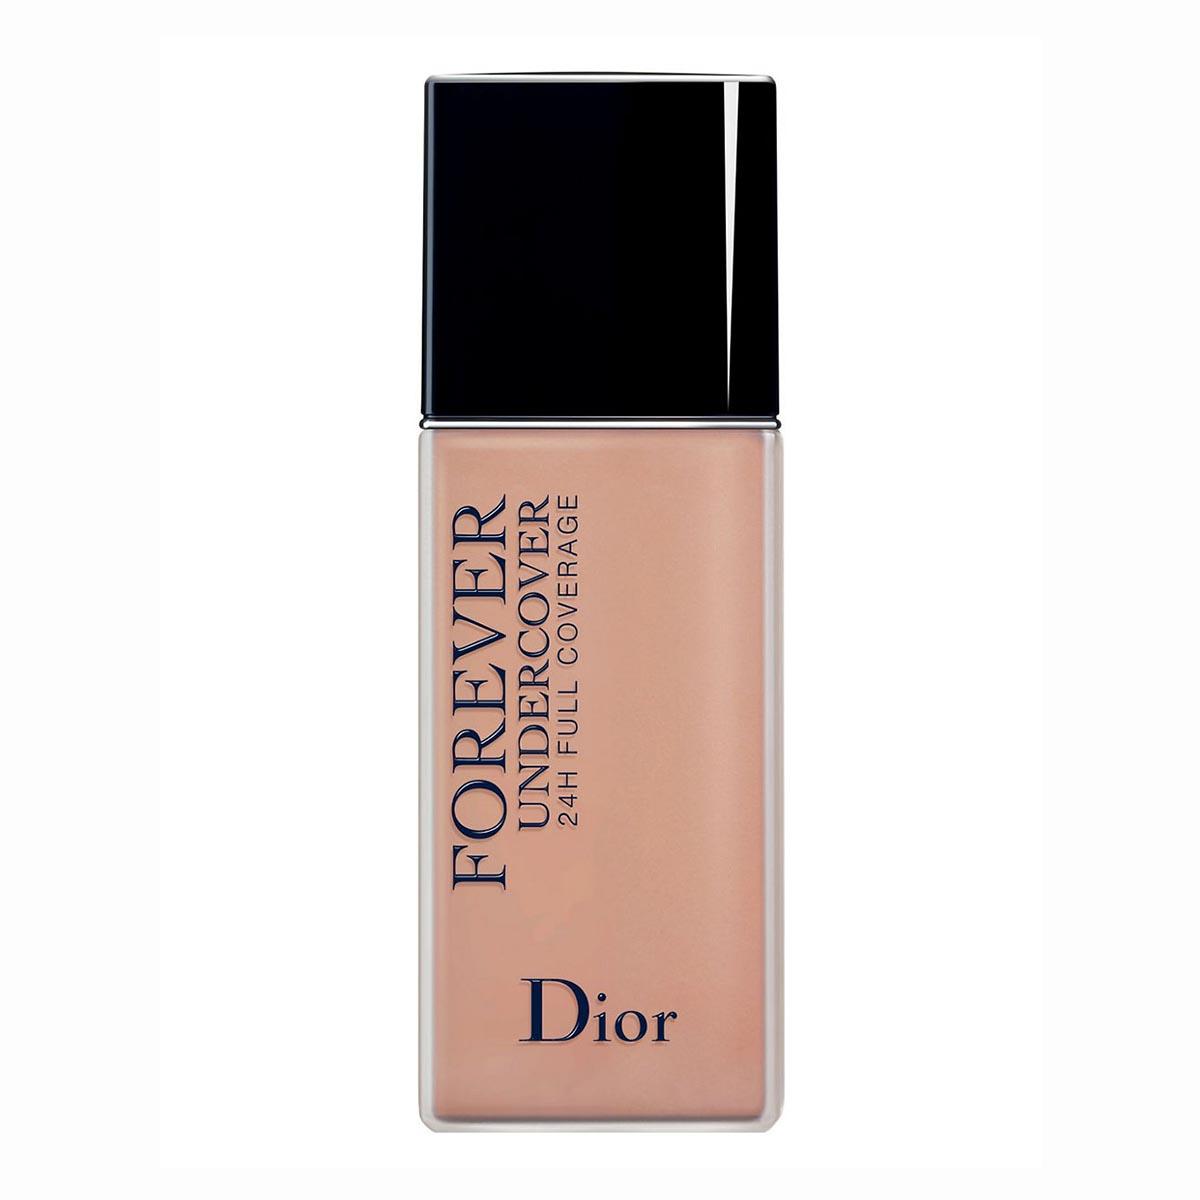 Dior diorskin forever undercover fond de teint 033